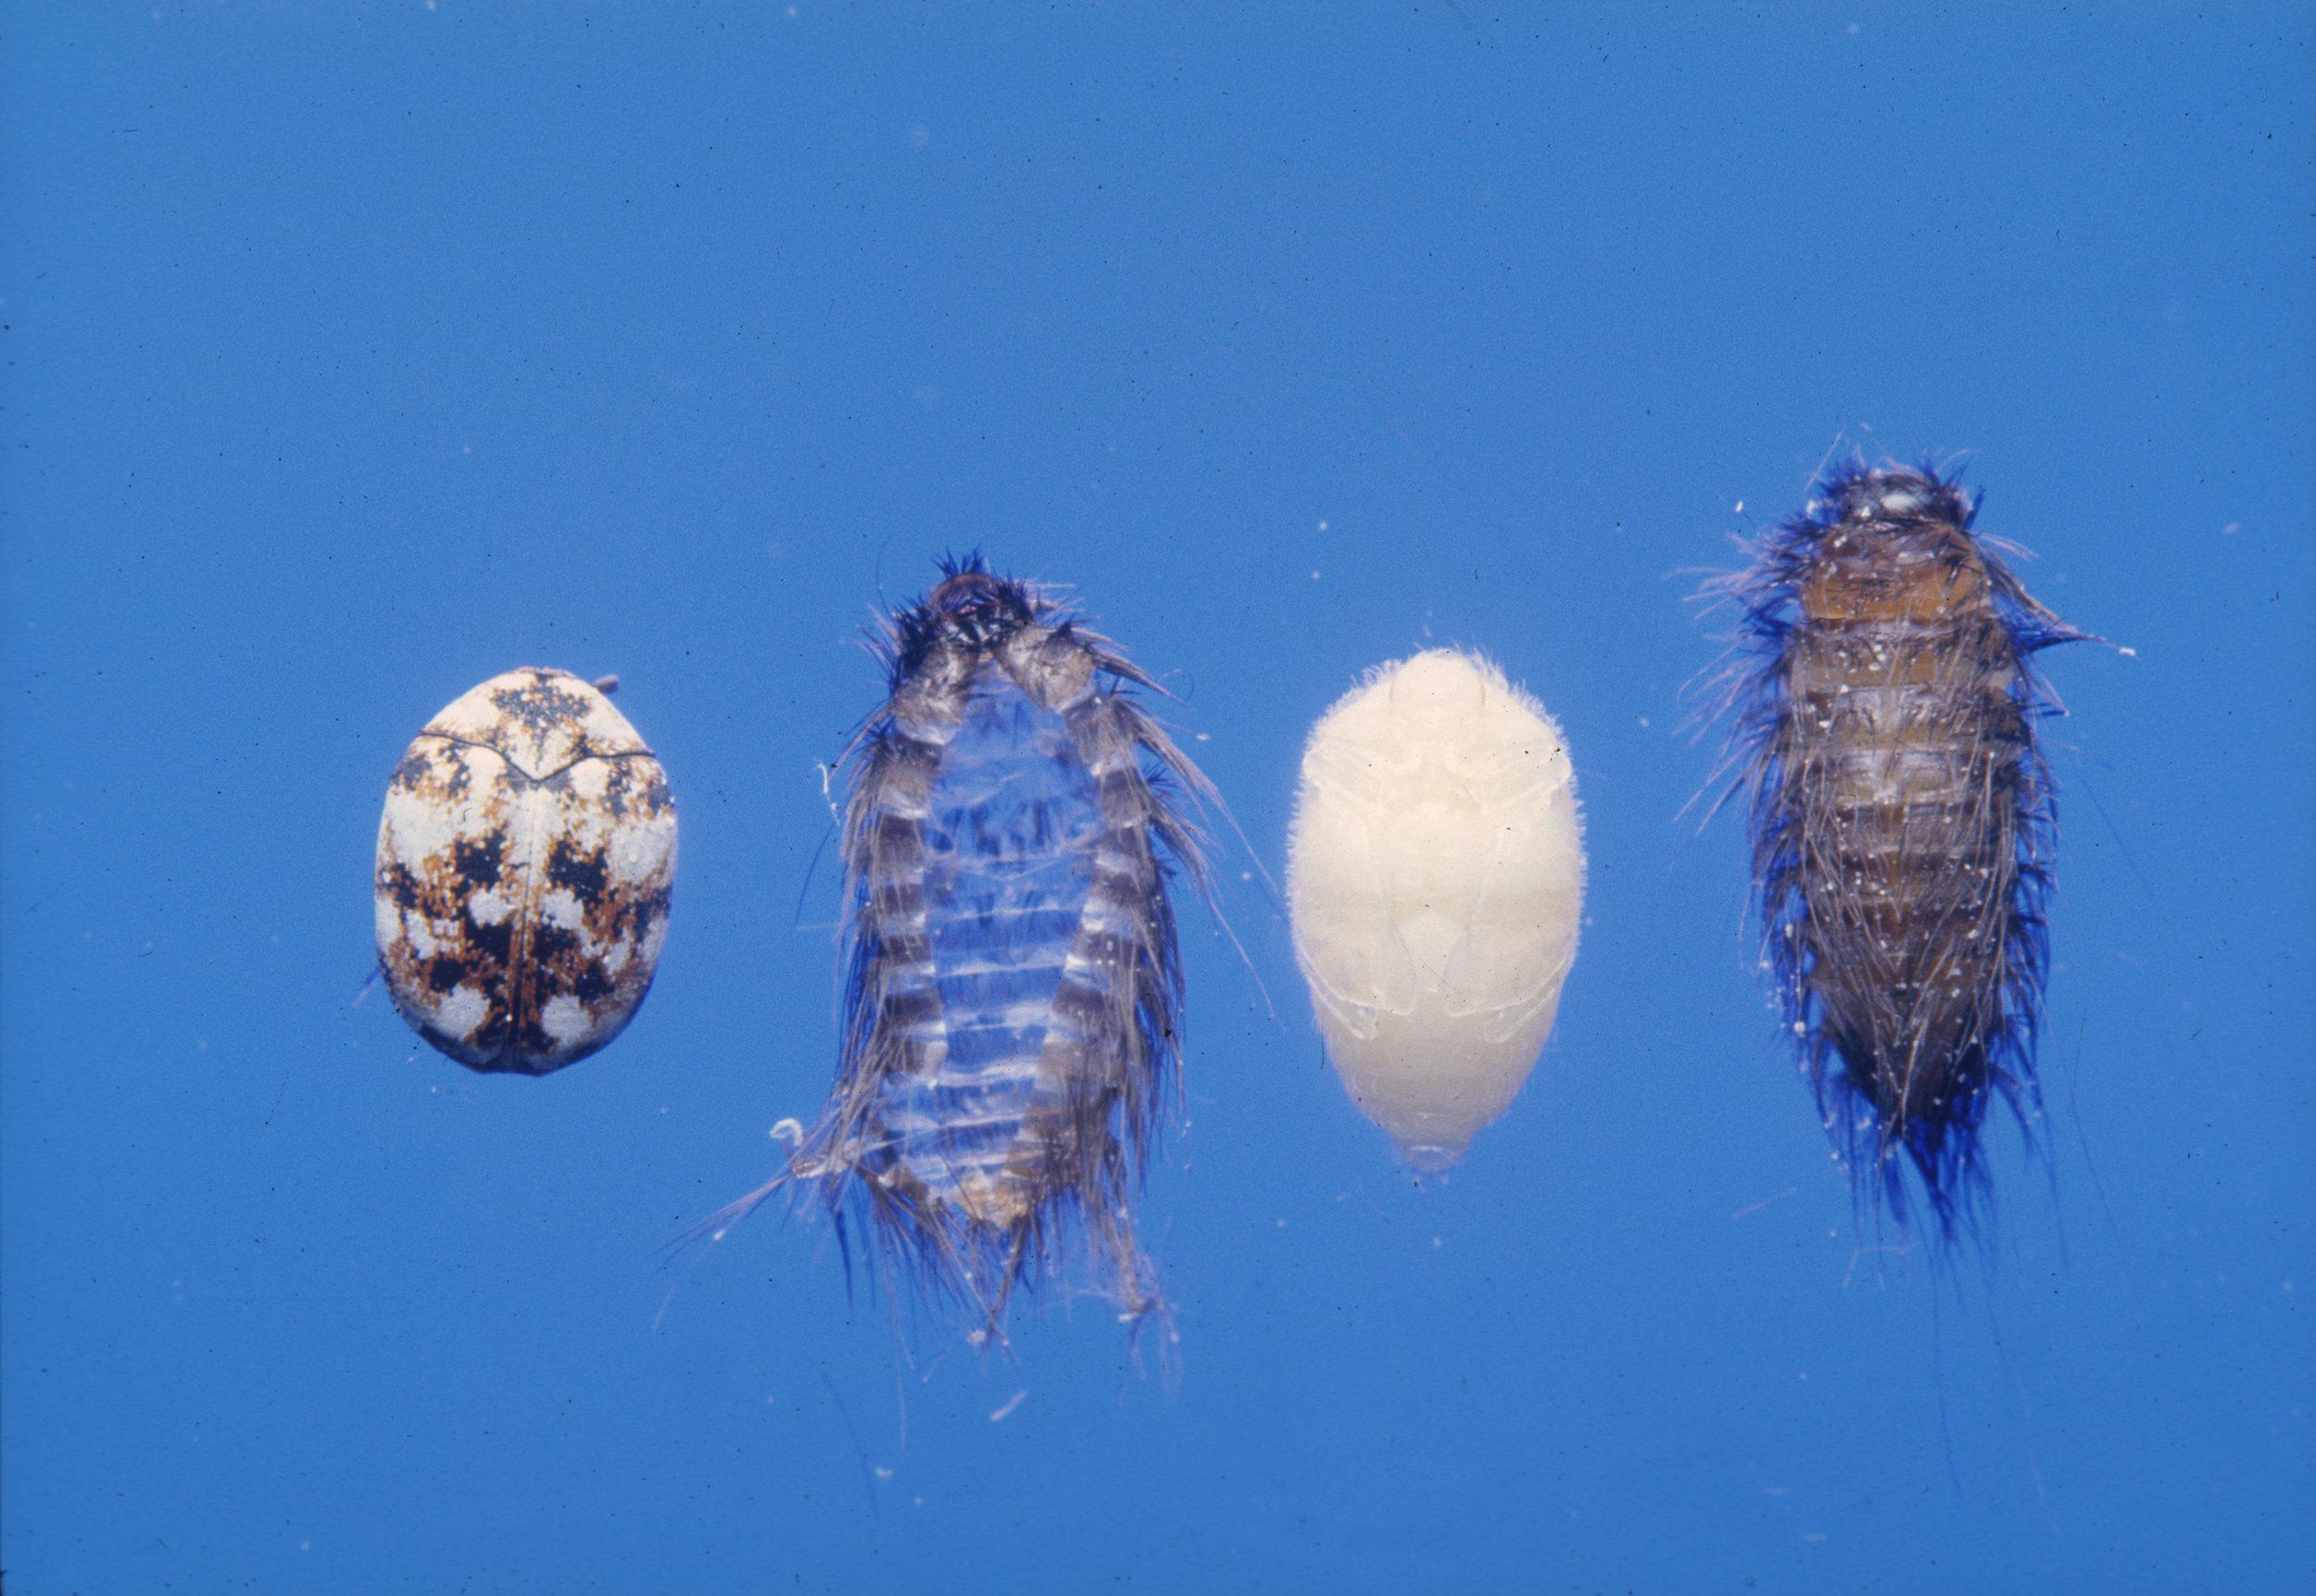 Carpet Beetle Eggs and Larva